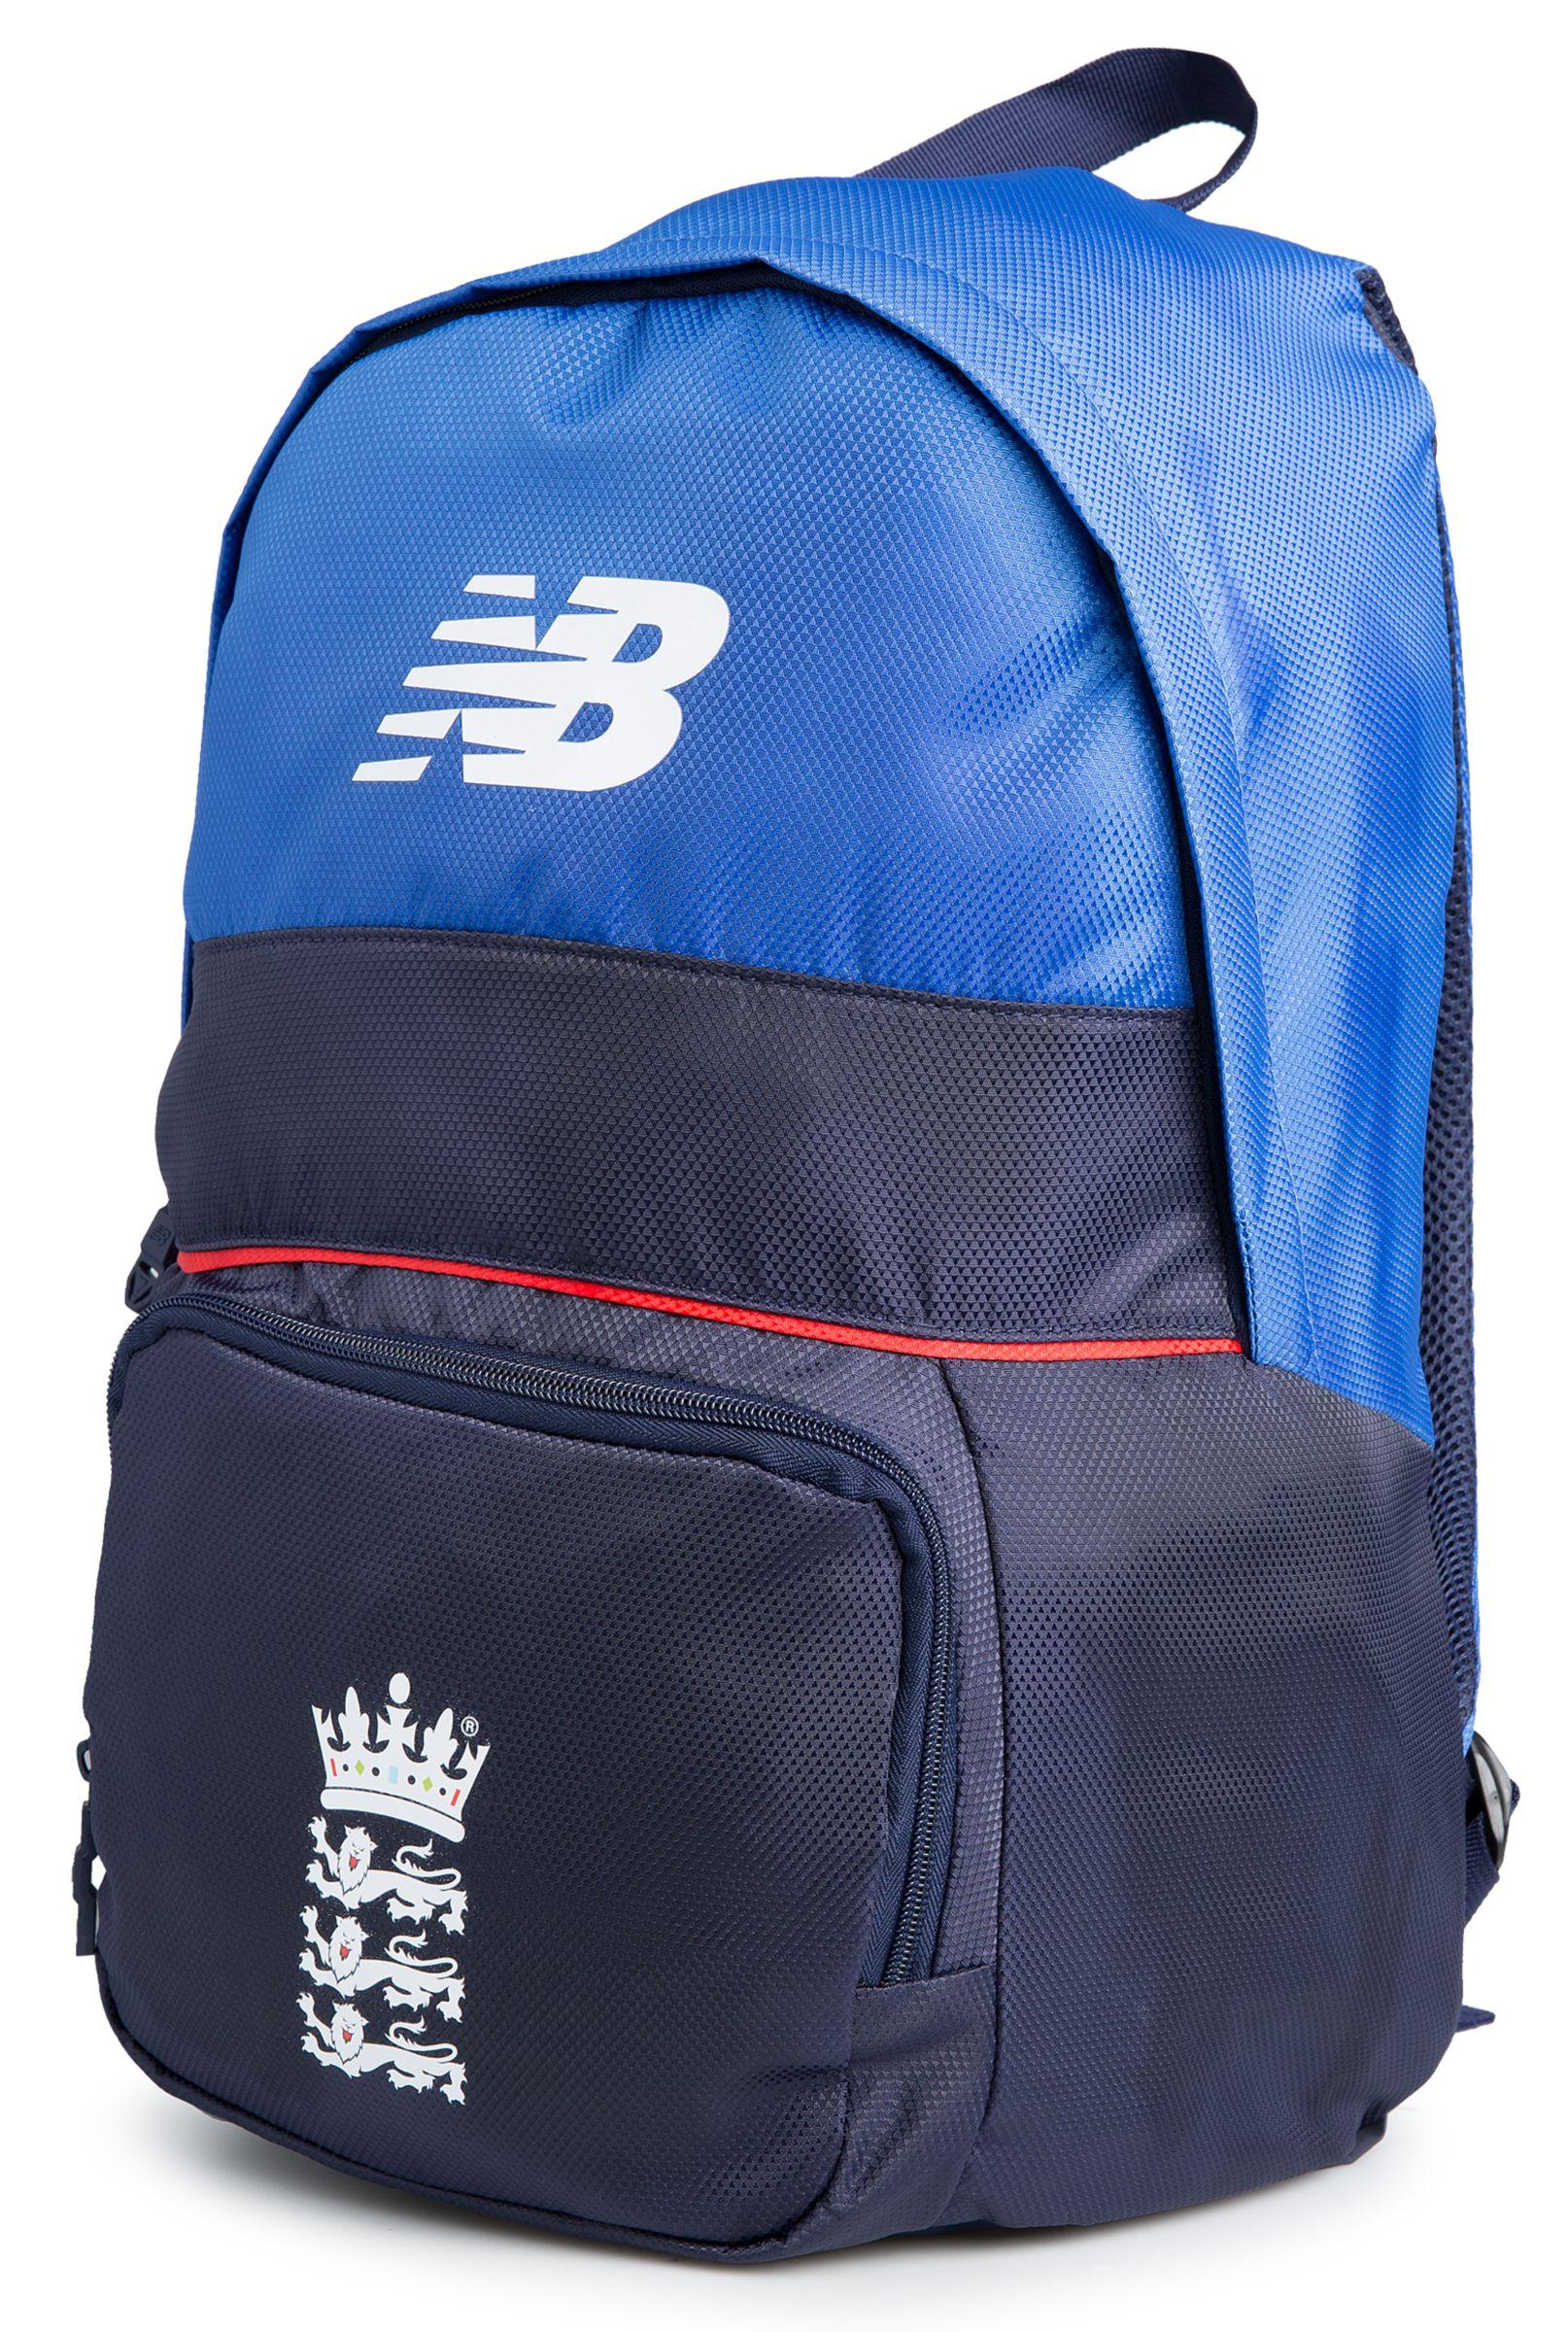 NB ECB Duffle Bag, Pigment